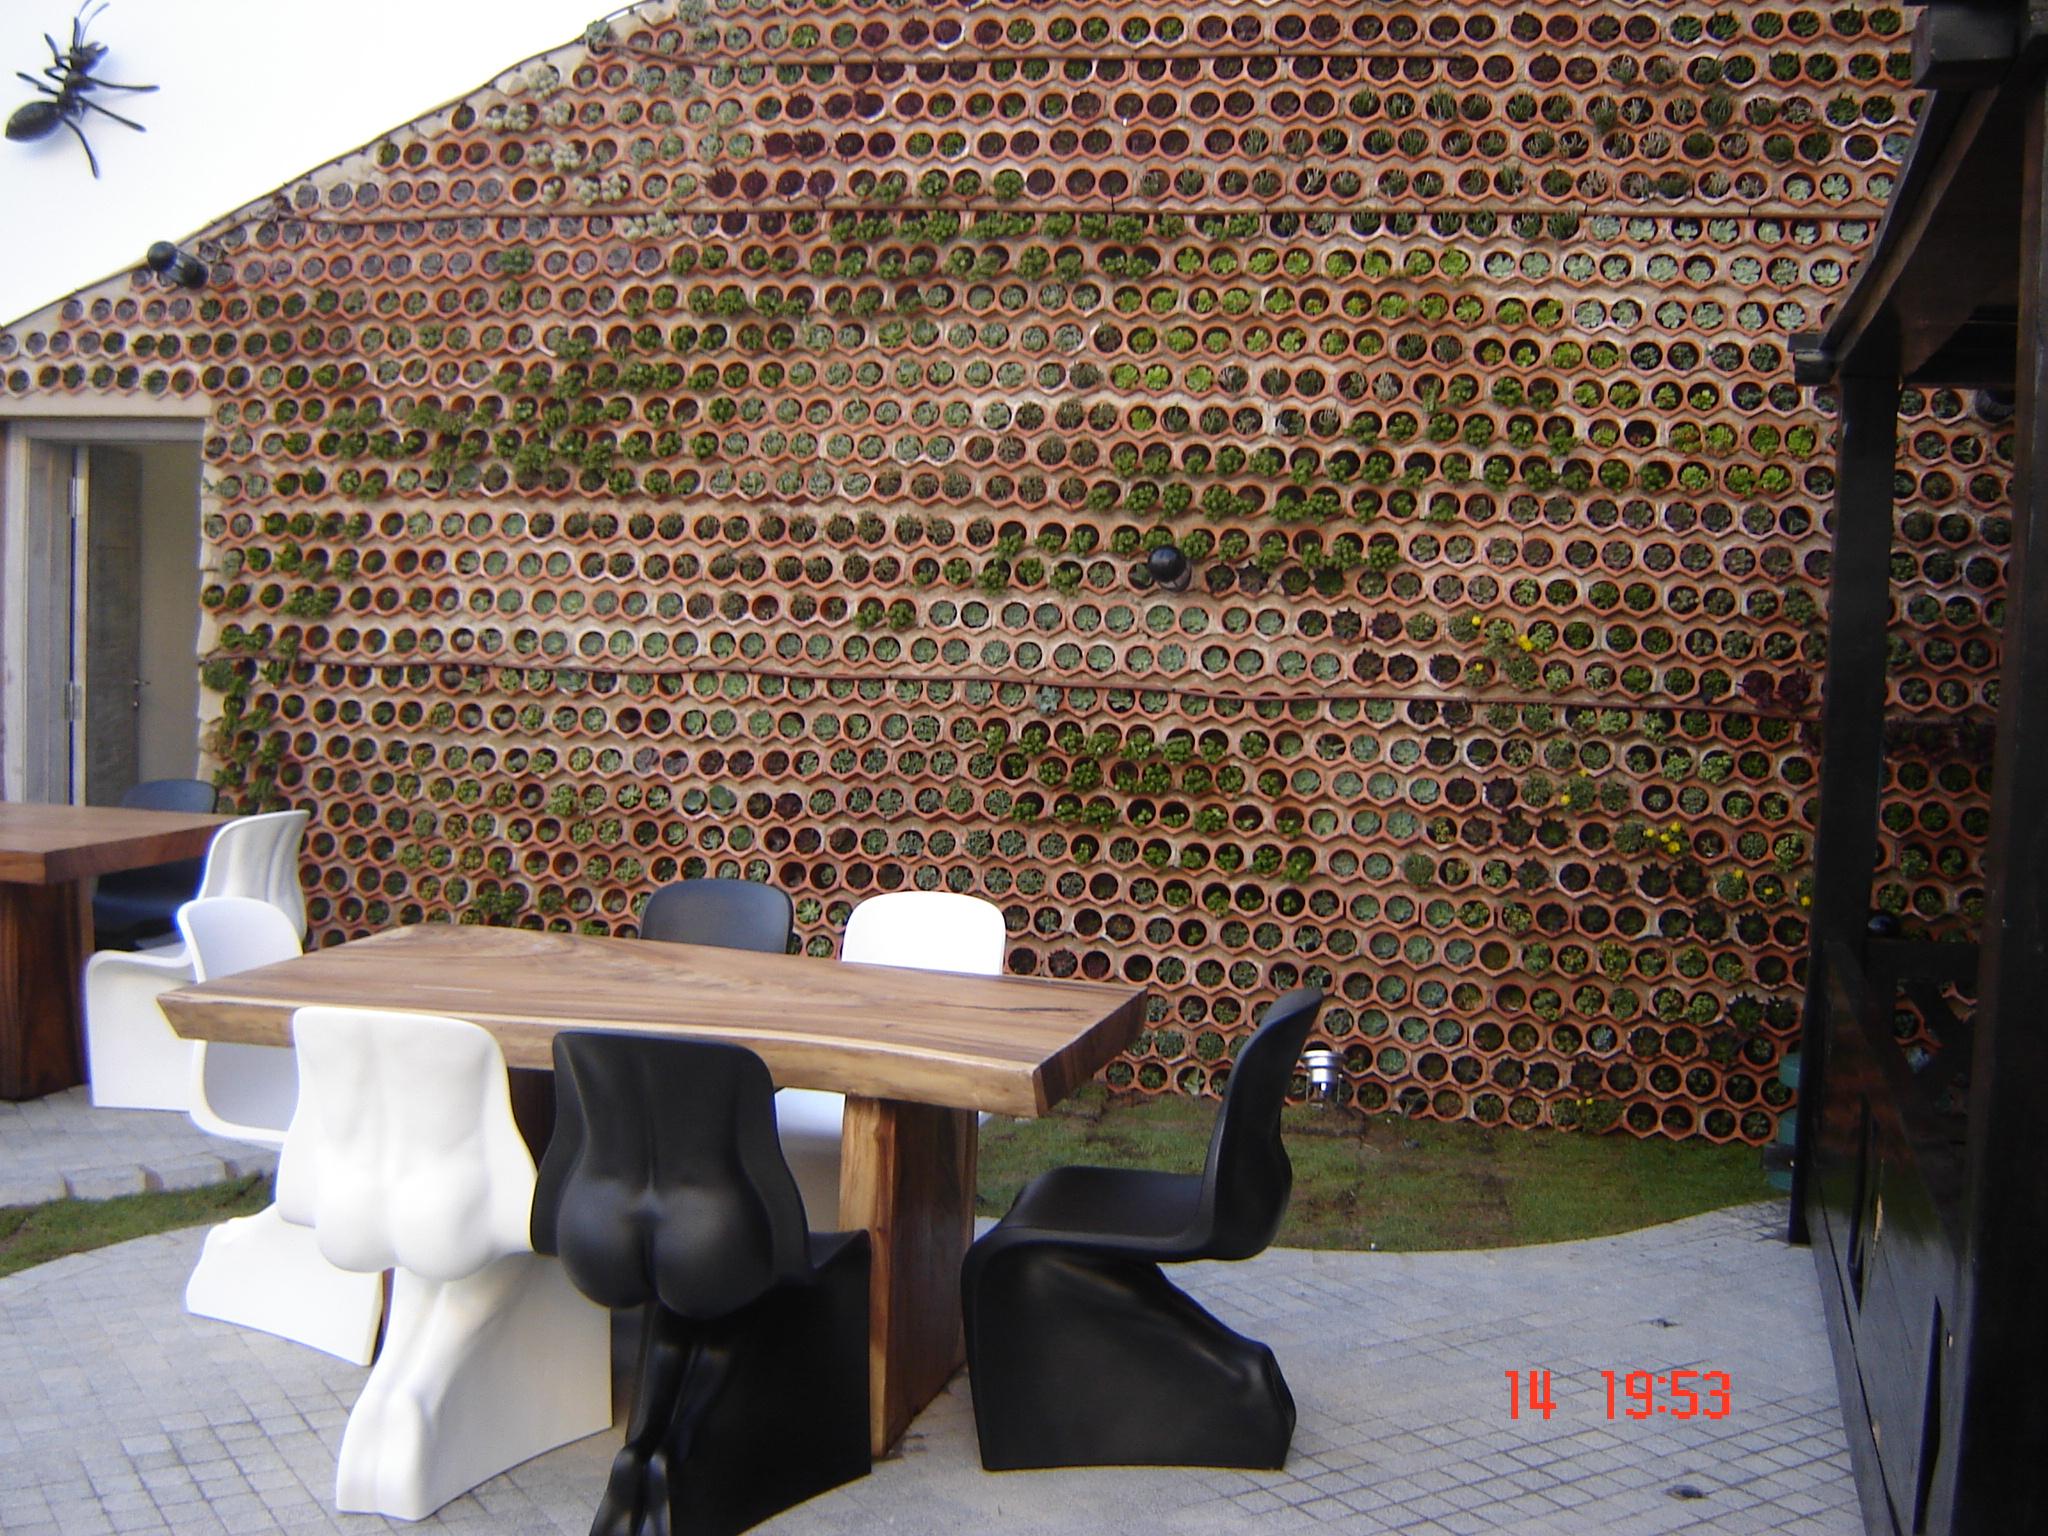 Jardin vertical mod eco bin en hotel ushuaia ibiza for Hotel el jardin vertical vilafames